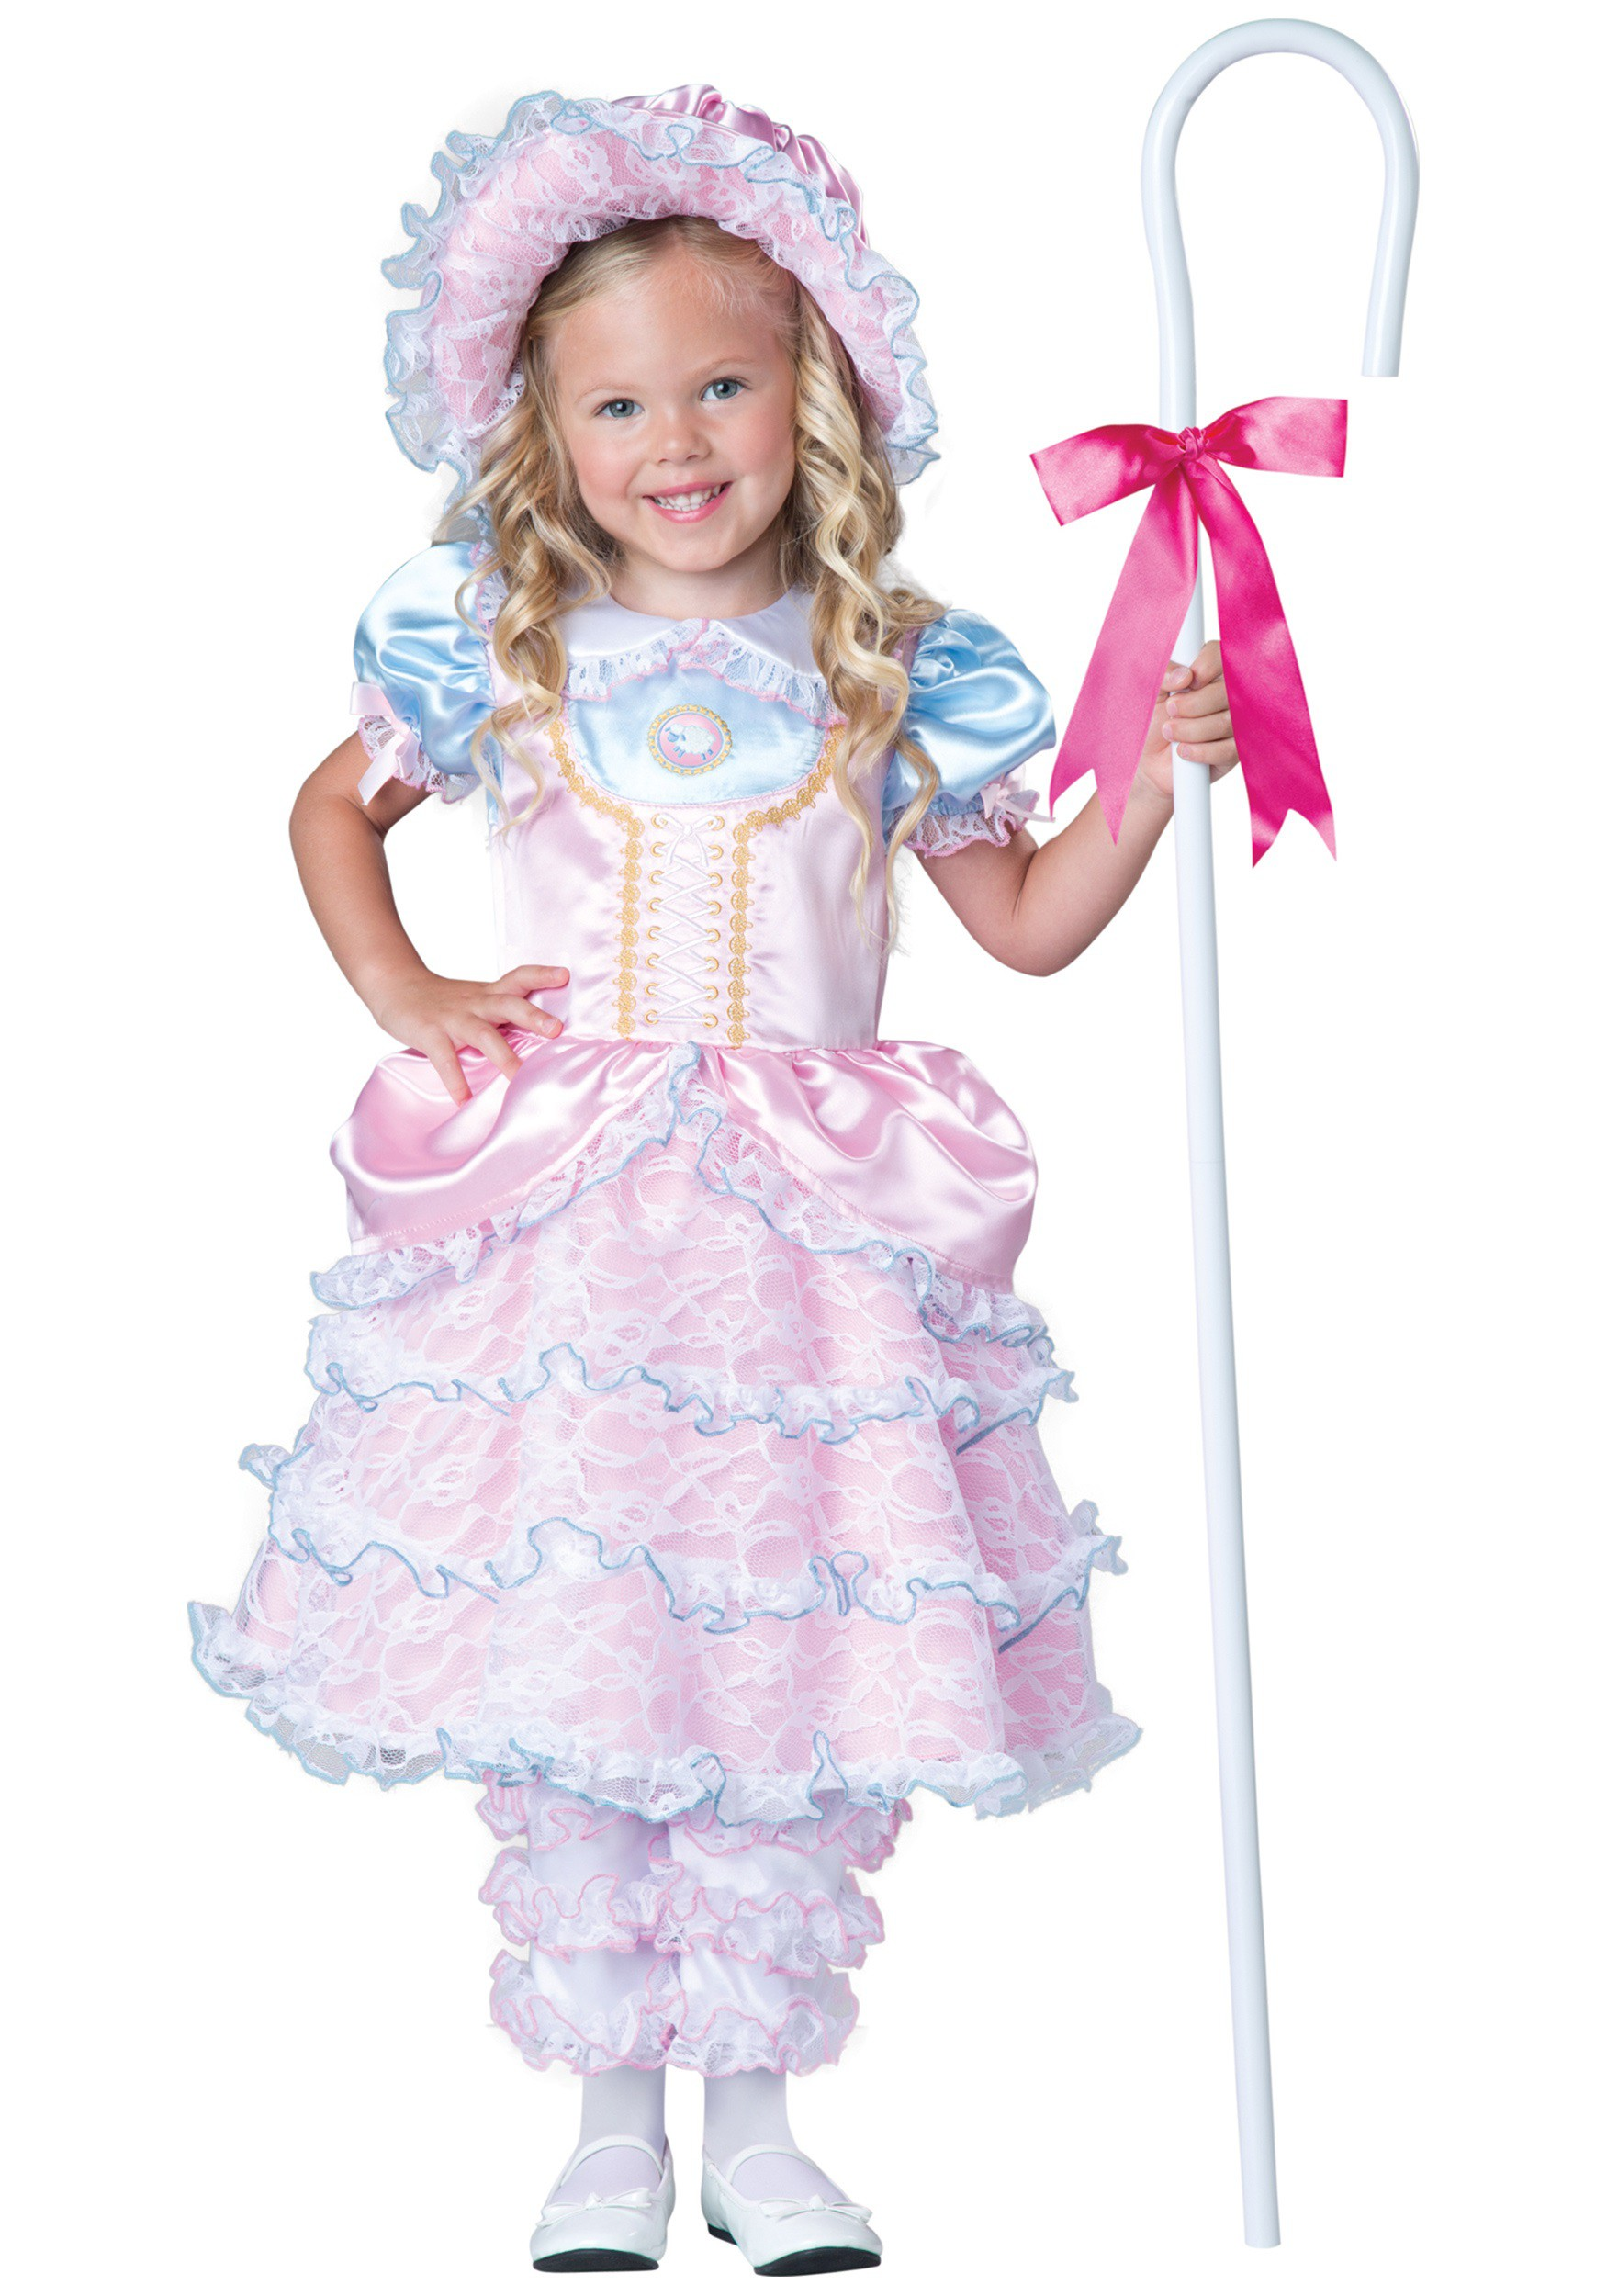 Baby Lamb & Sheep Costumes - HalloweenCostumes.com